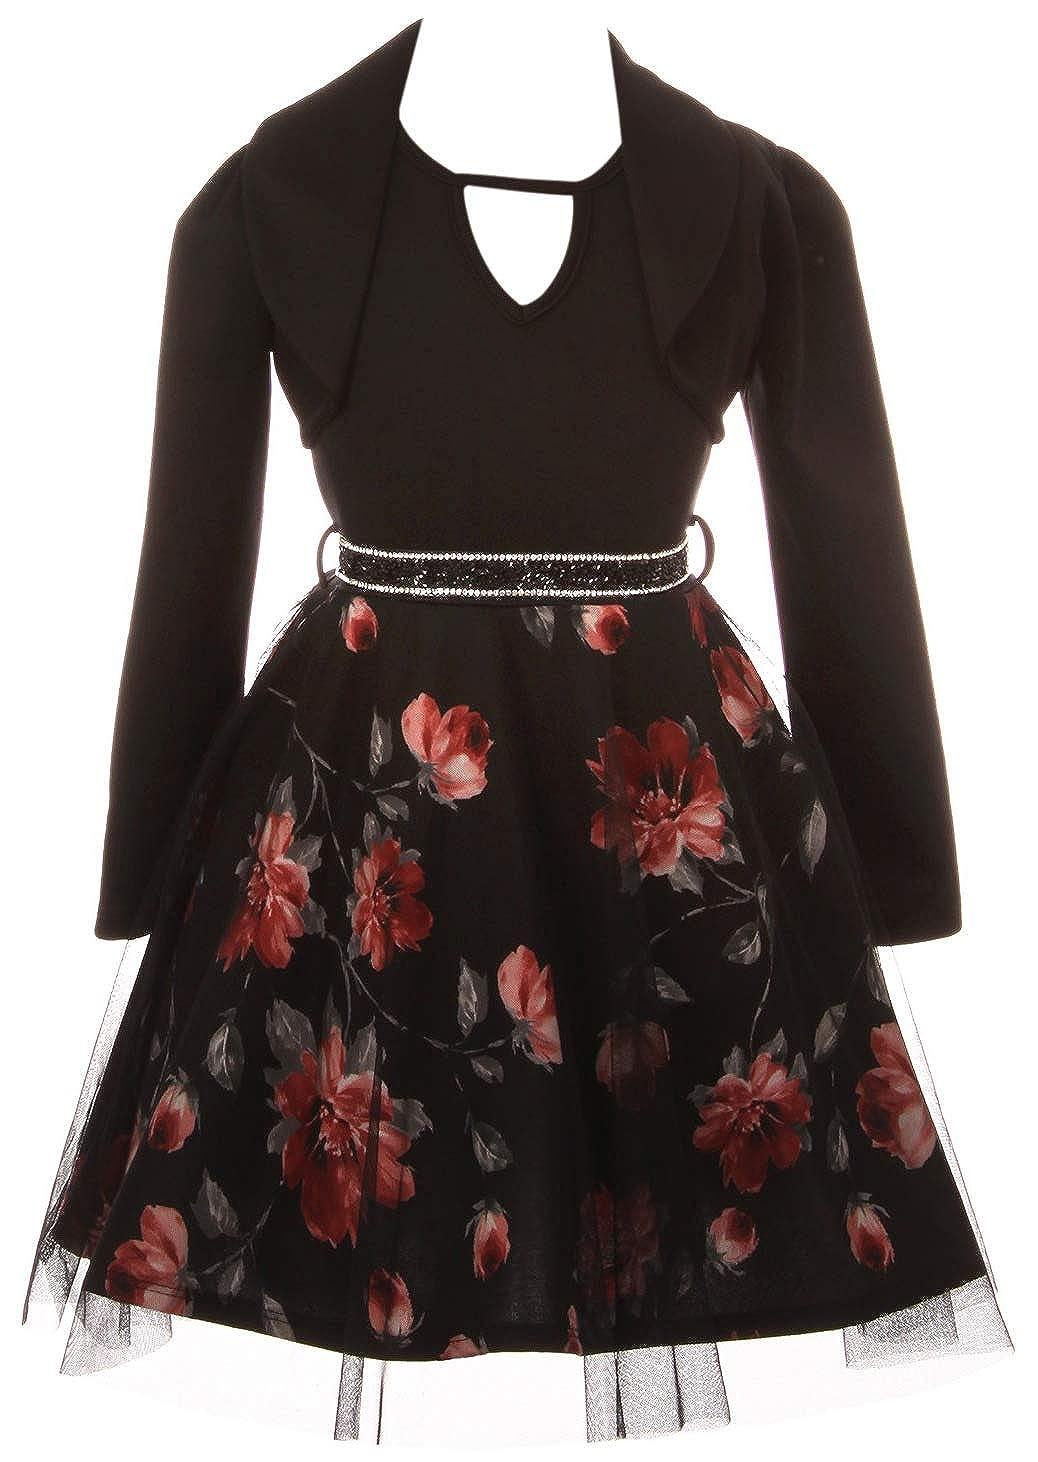 734e283298 Amazon.com: BluNight Collection Elegant Sleeveless One Piece Dress Crop  Jacket Birthday Party Flower Girl Dress: Clothing